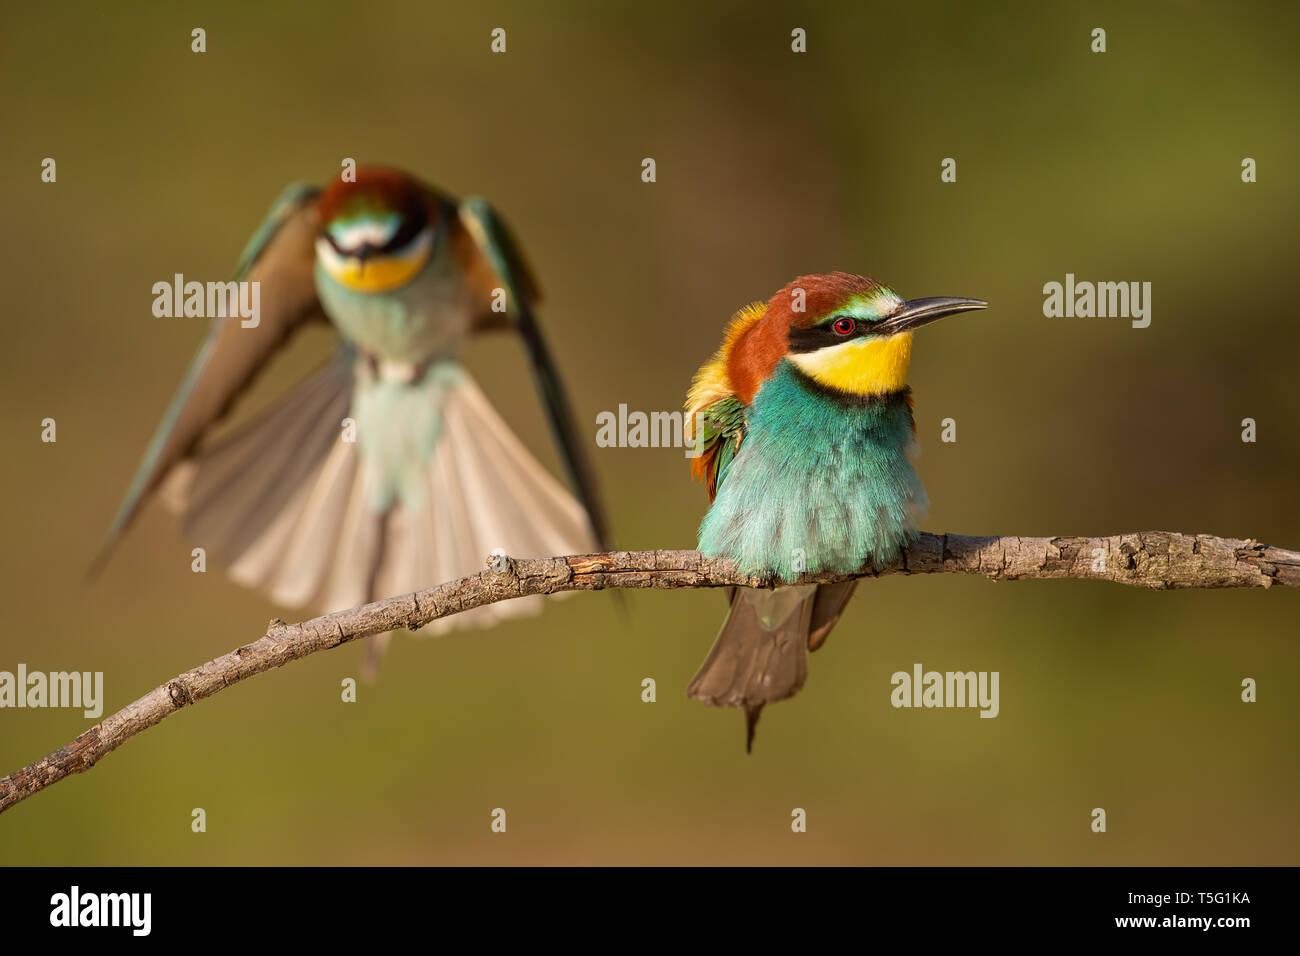 Pareja de abejarucos europeo, Merops apiaster. Foto de stock